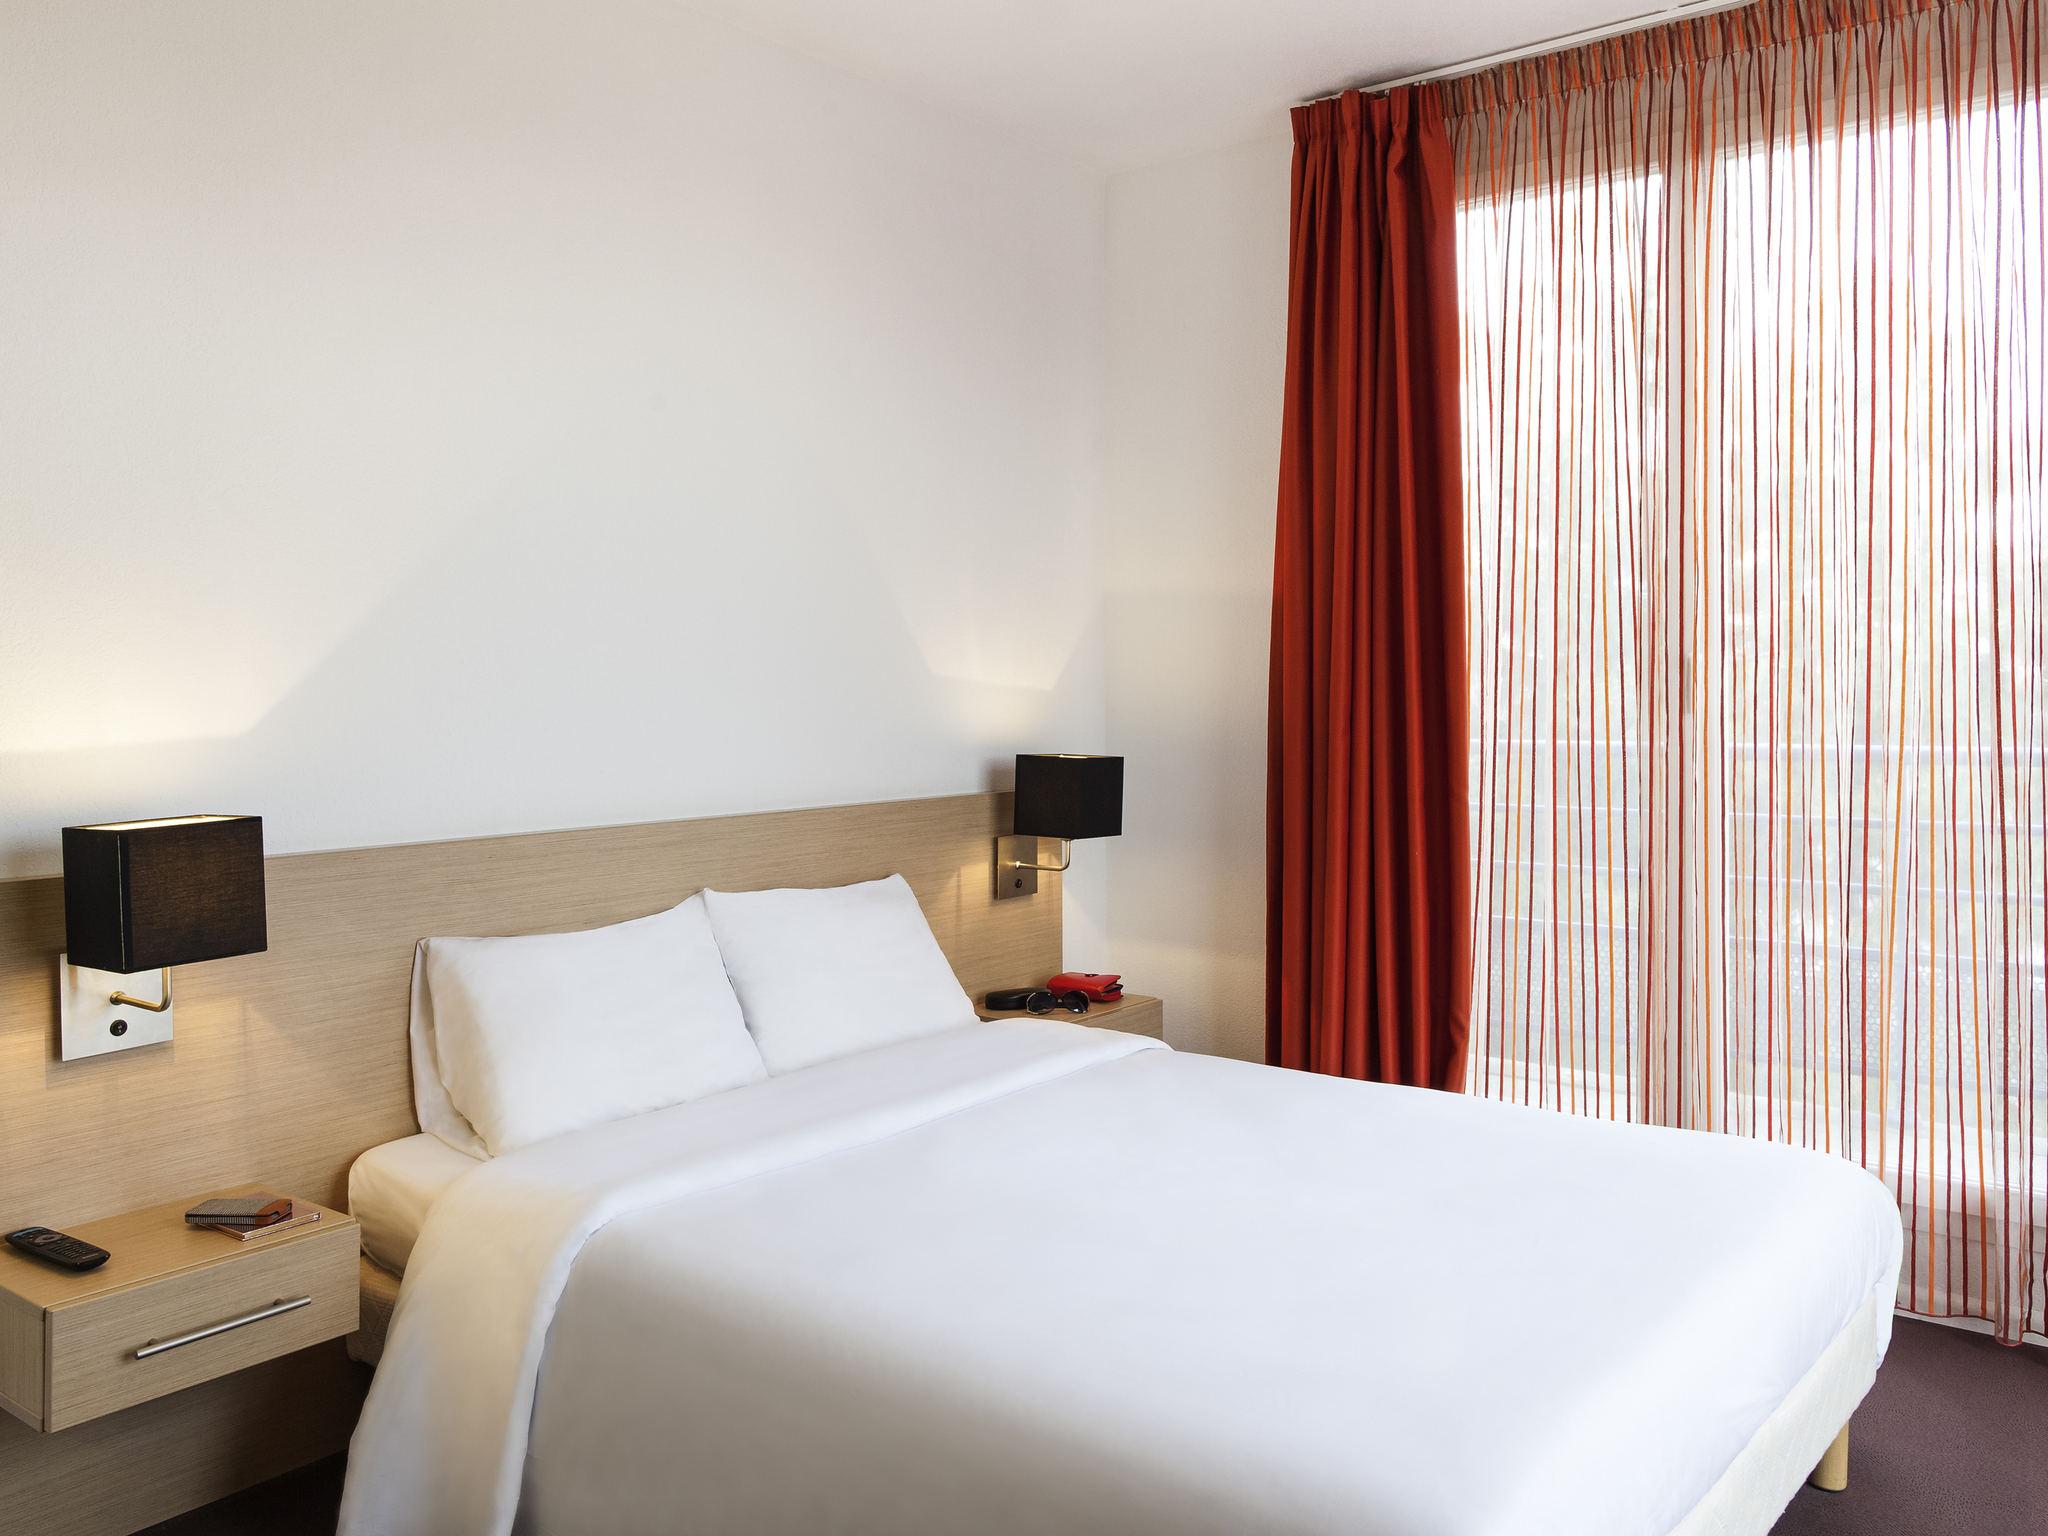 Hotell – Aparthotel Adagio access Saint-Louis Bâle